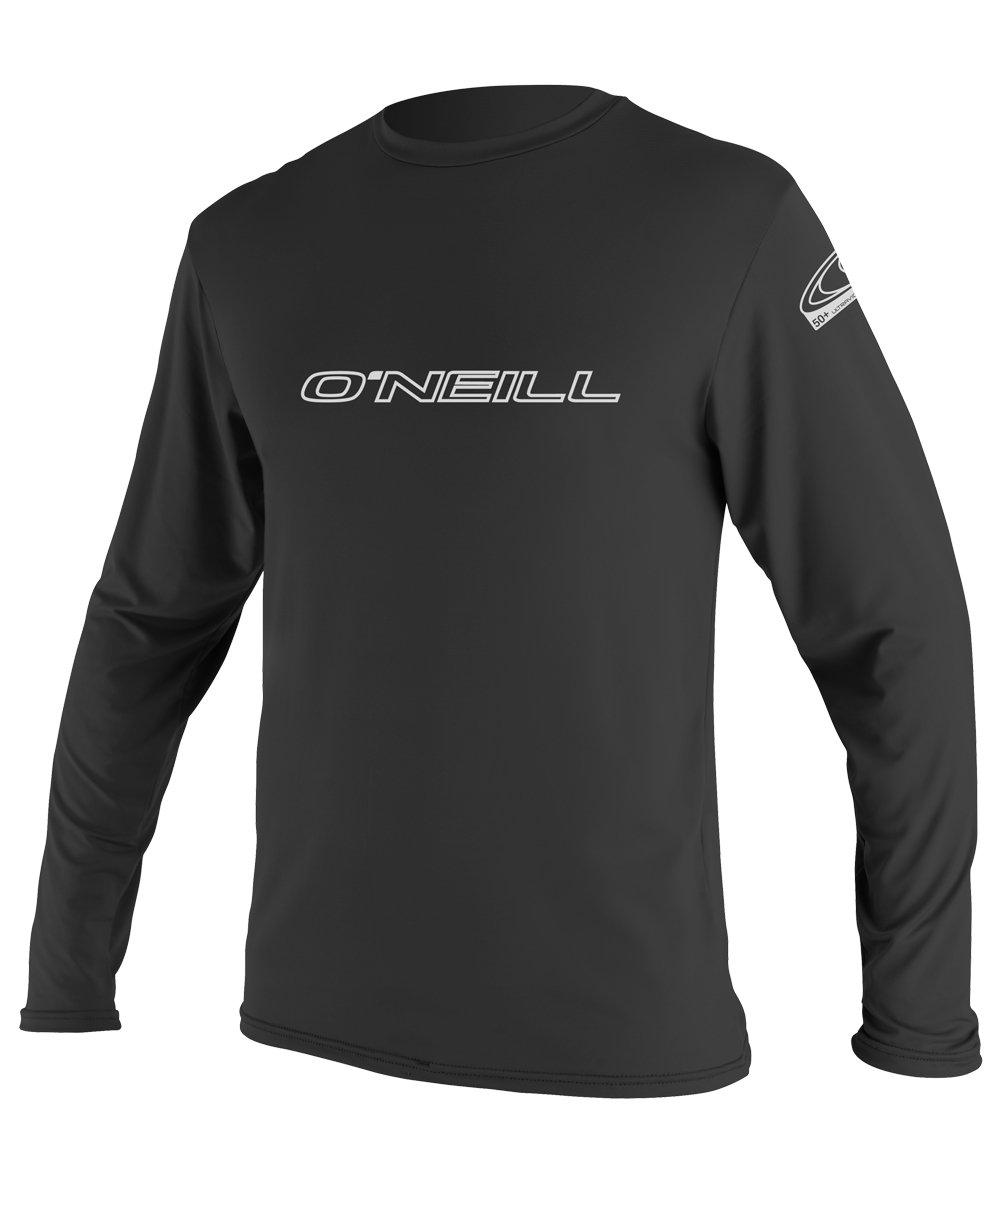 O'Neill   Men's Basic Skins UPF 50+ Long Sleeve Sun Shirt,Black,Medium by O'Neill Wetsuits (Image #1)